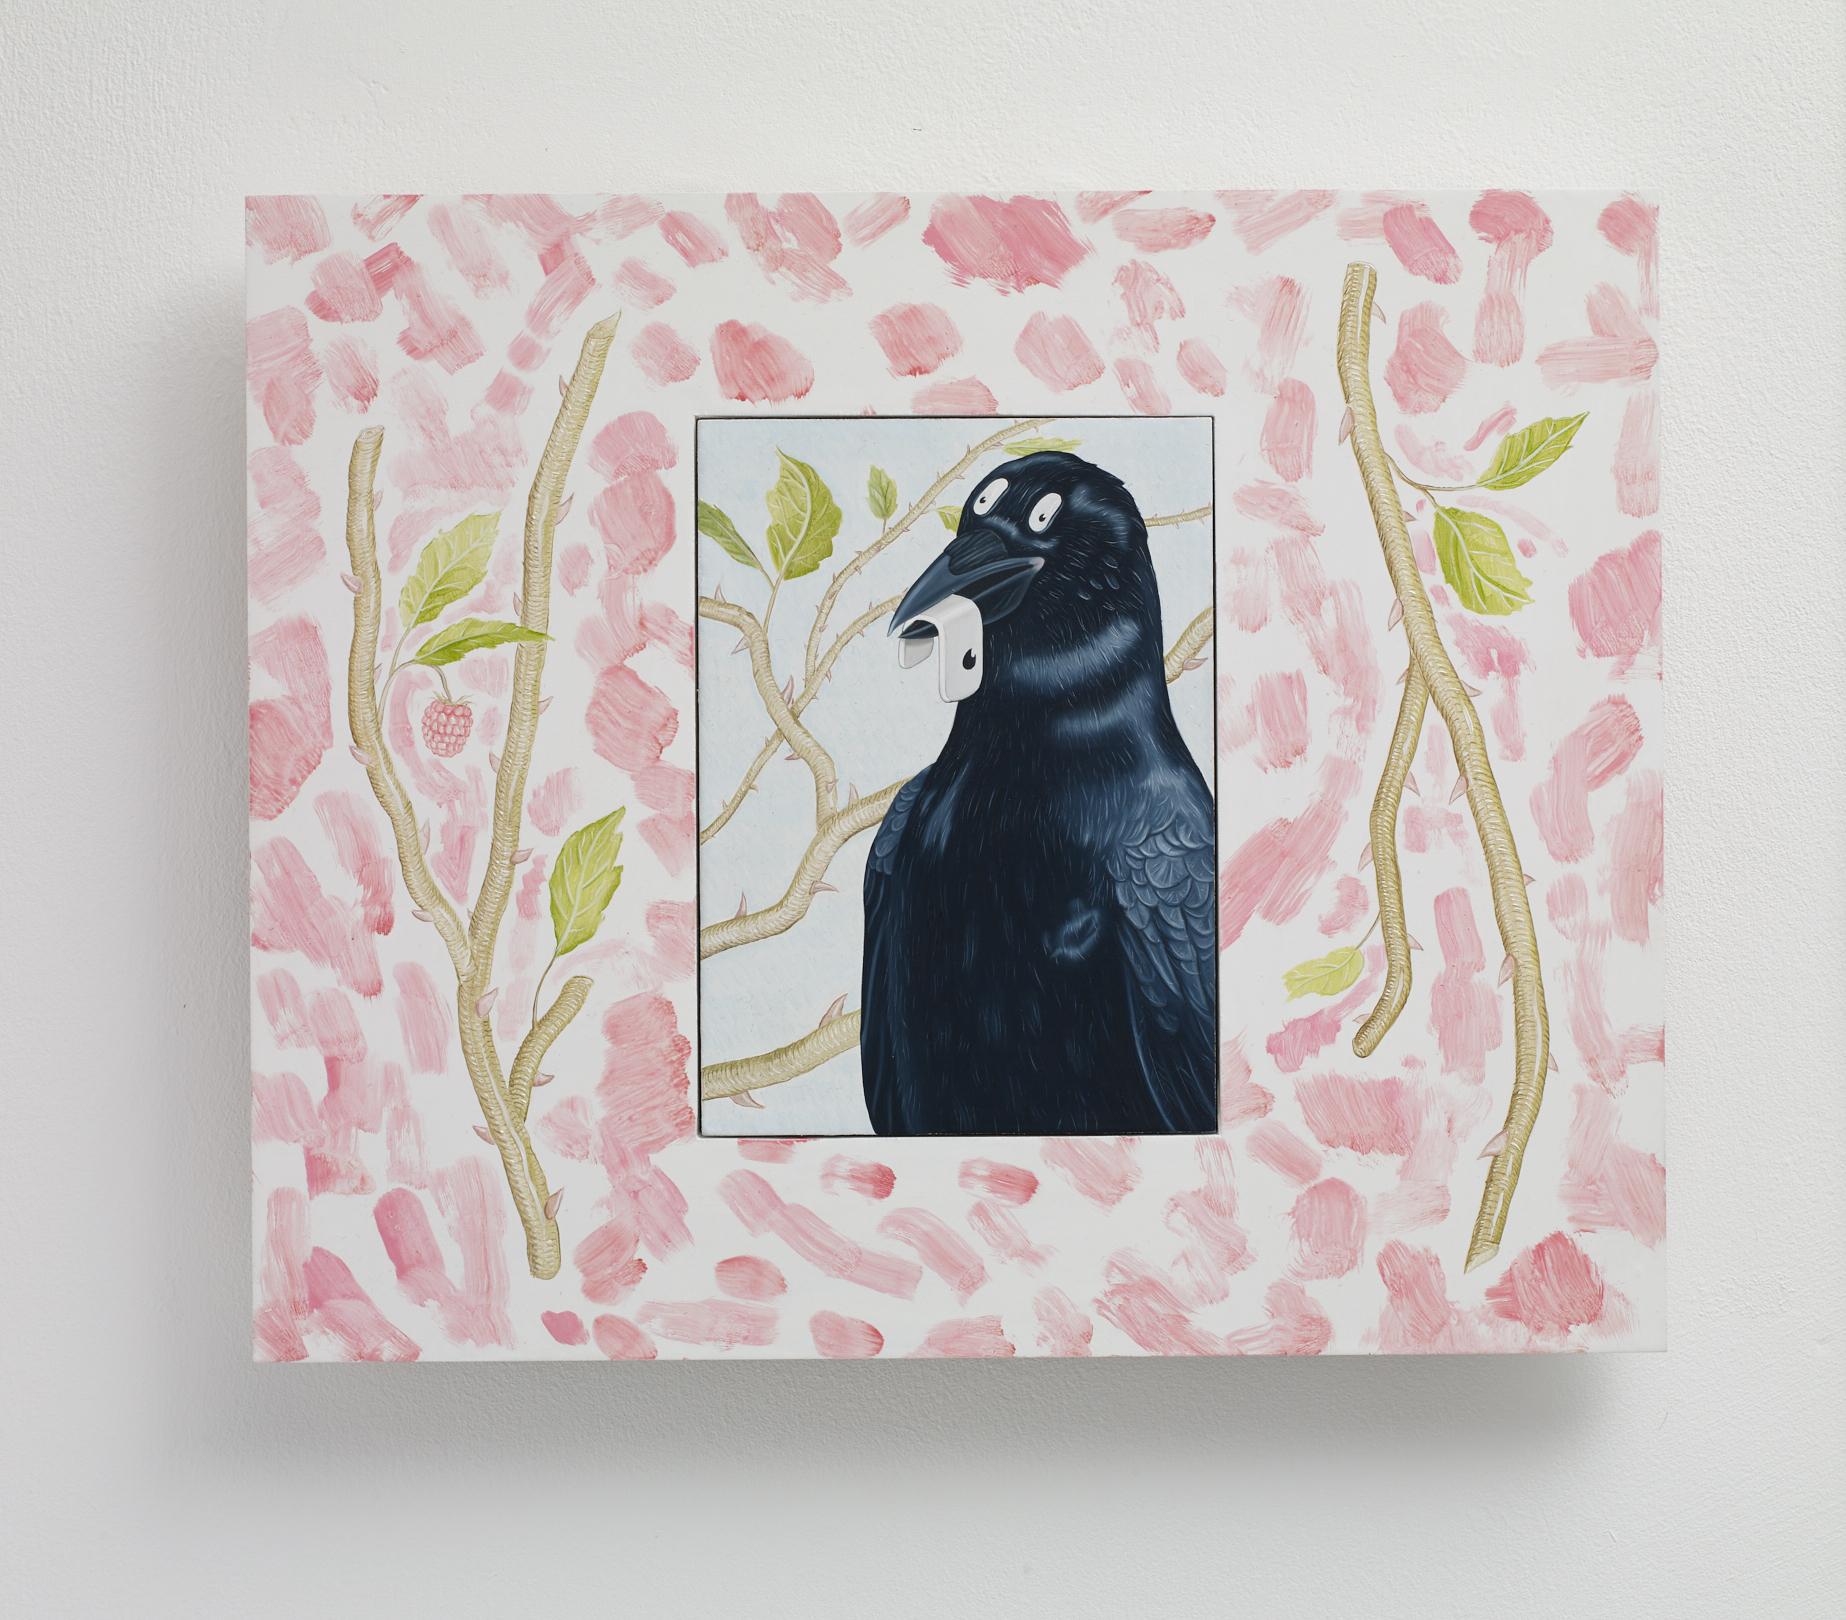 Tristan Pigott  Crow with Eye , 2019 oil on board 31.5 x 26 cm framed 16 x 11.5 unframed